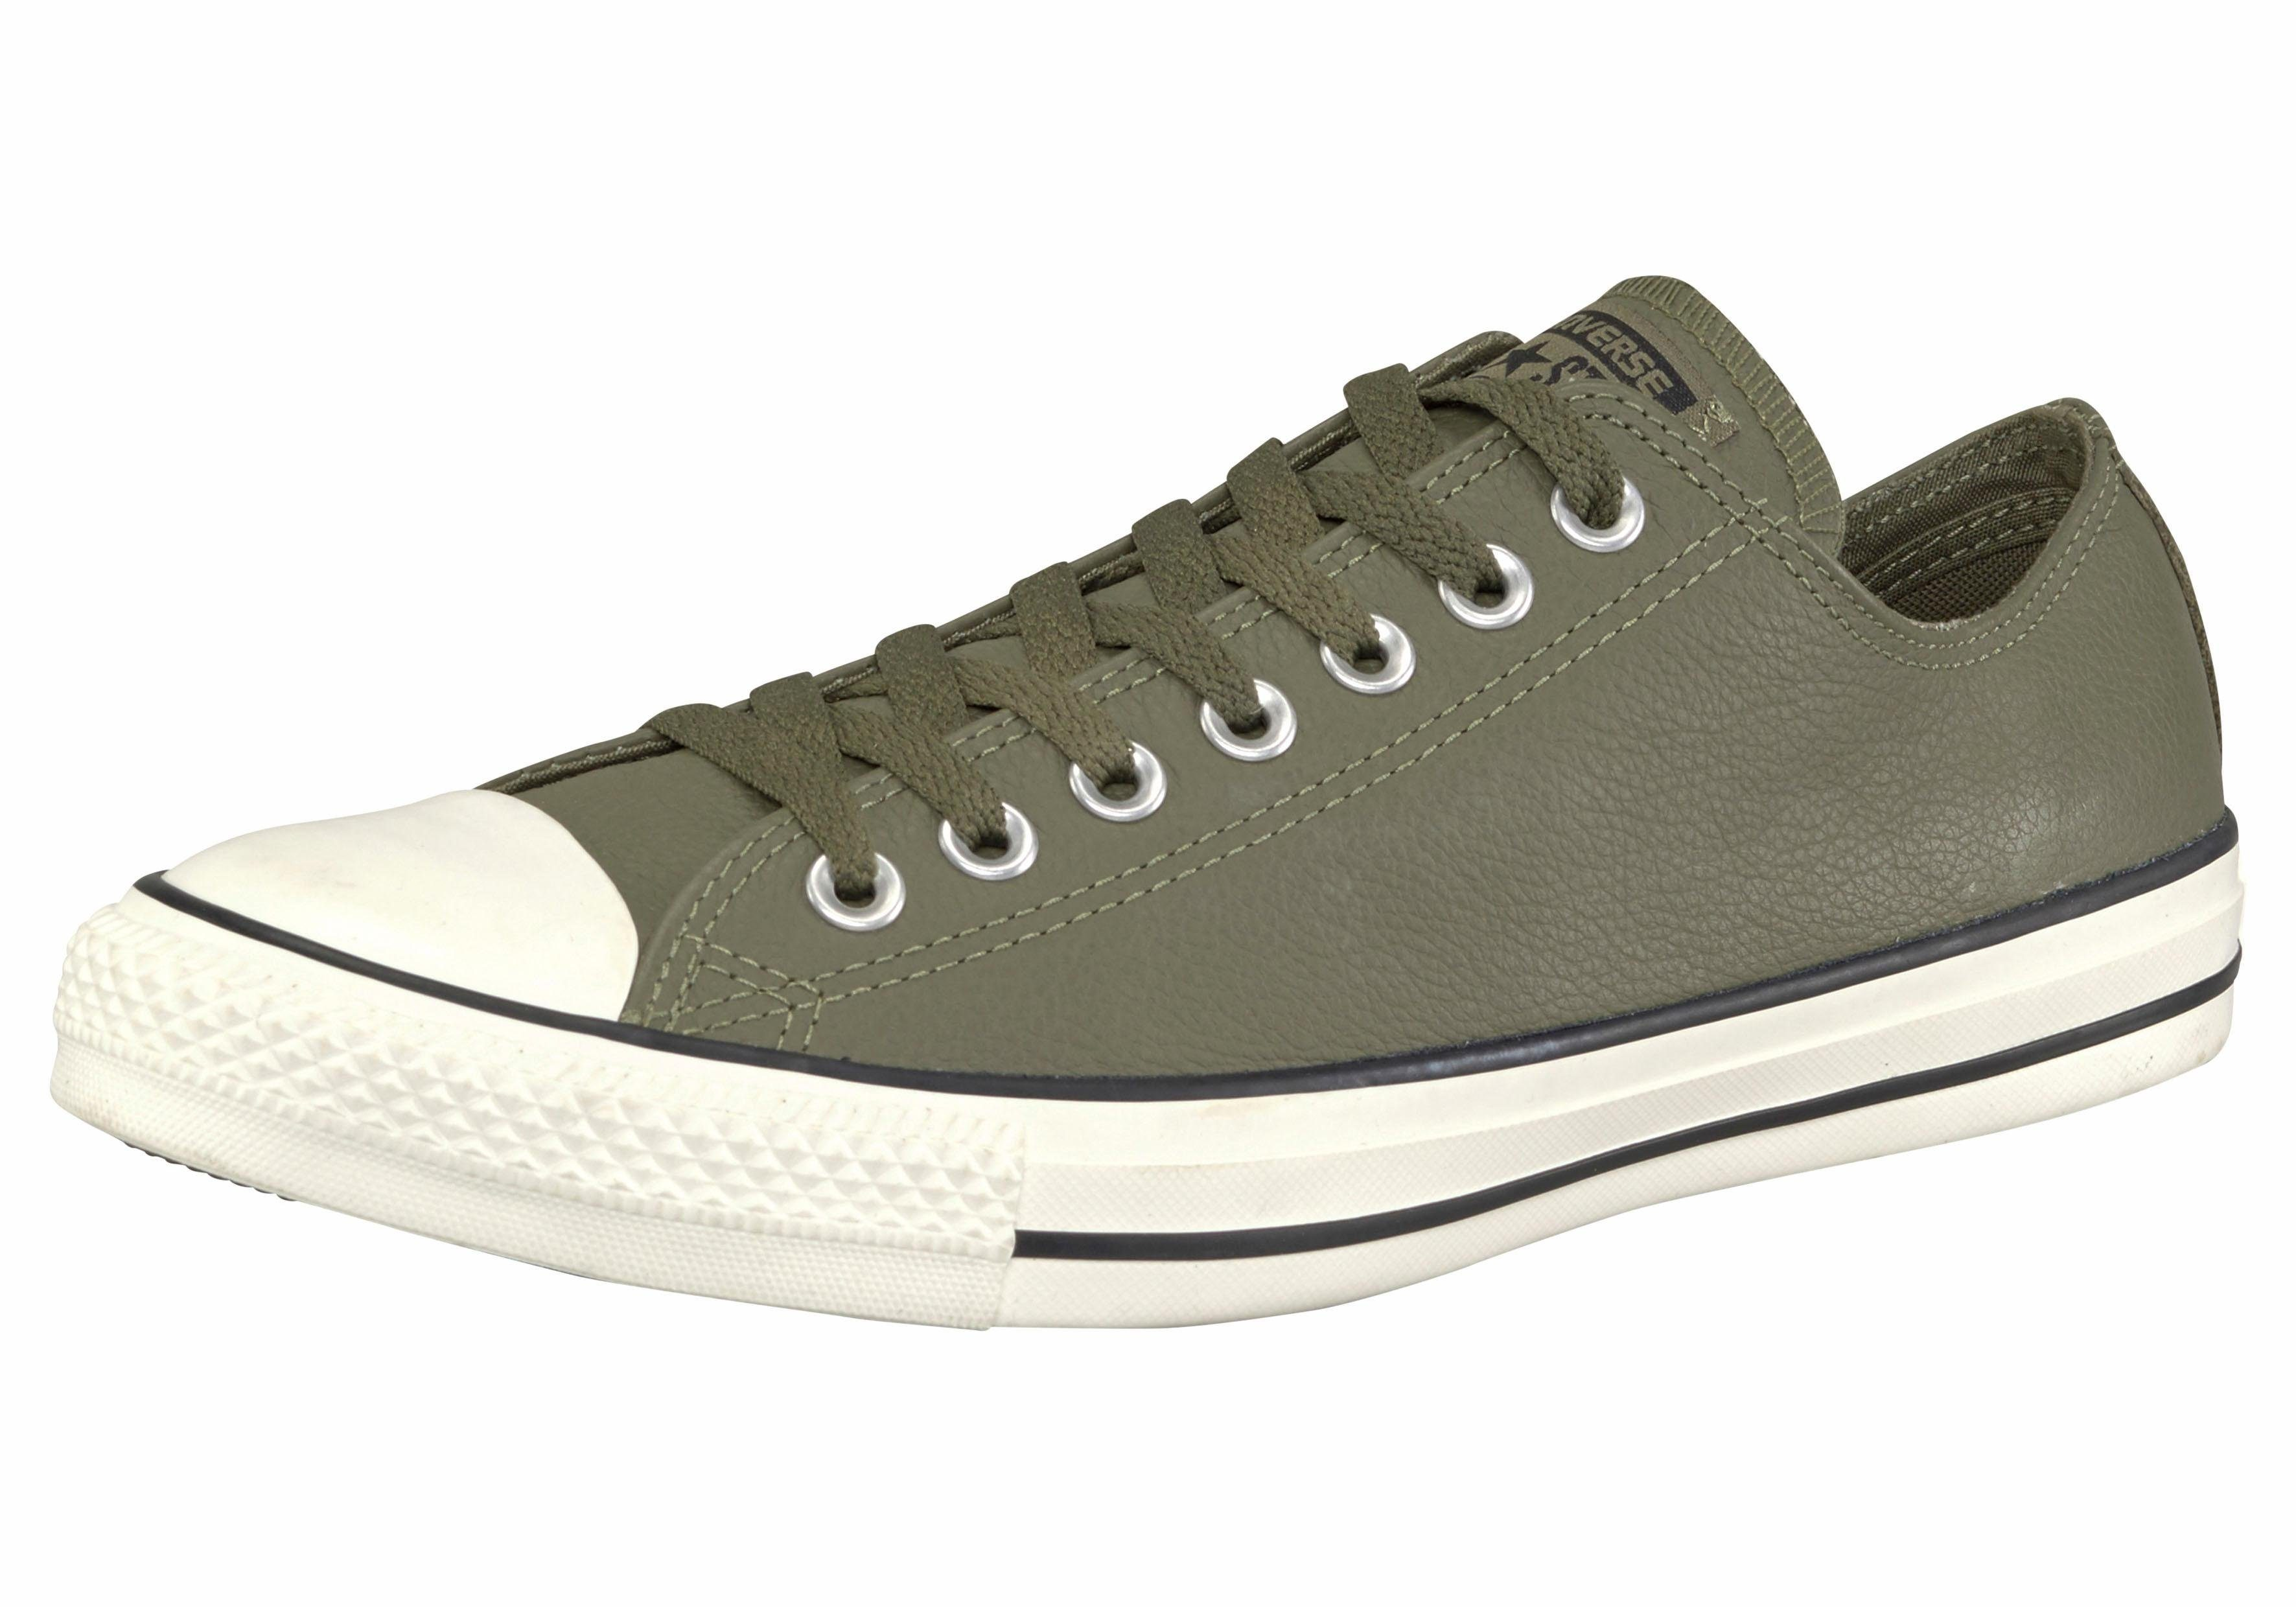 Converse Chuck Taylor All Star OX M Sneaker  olivgrün